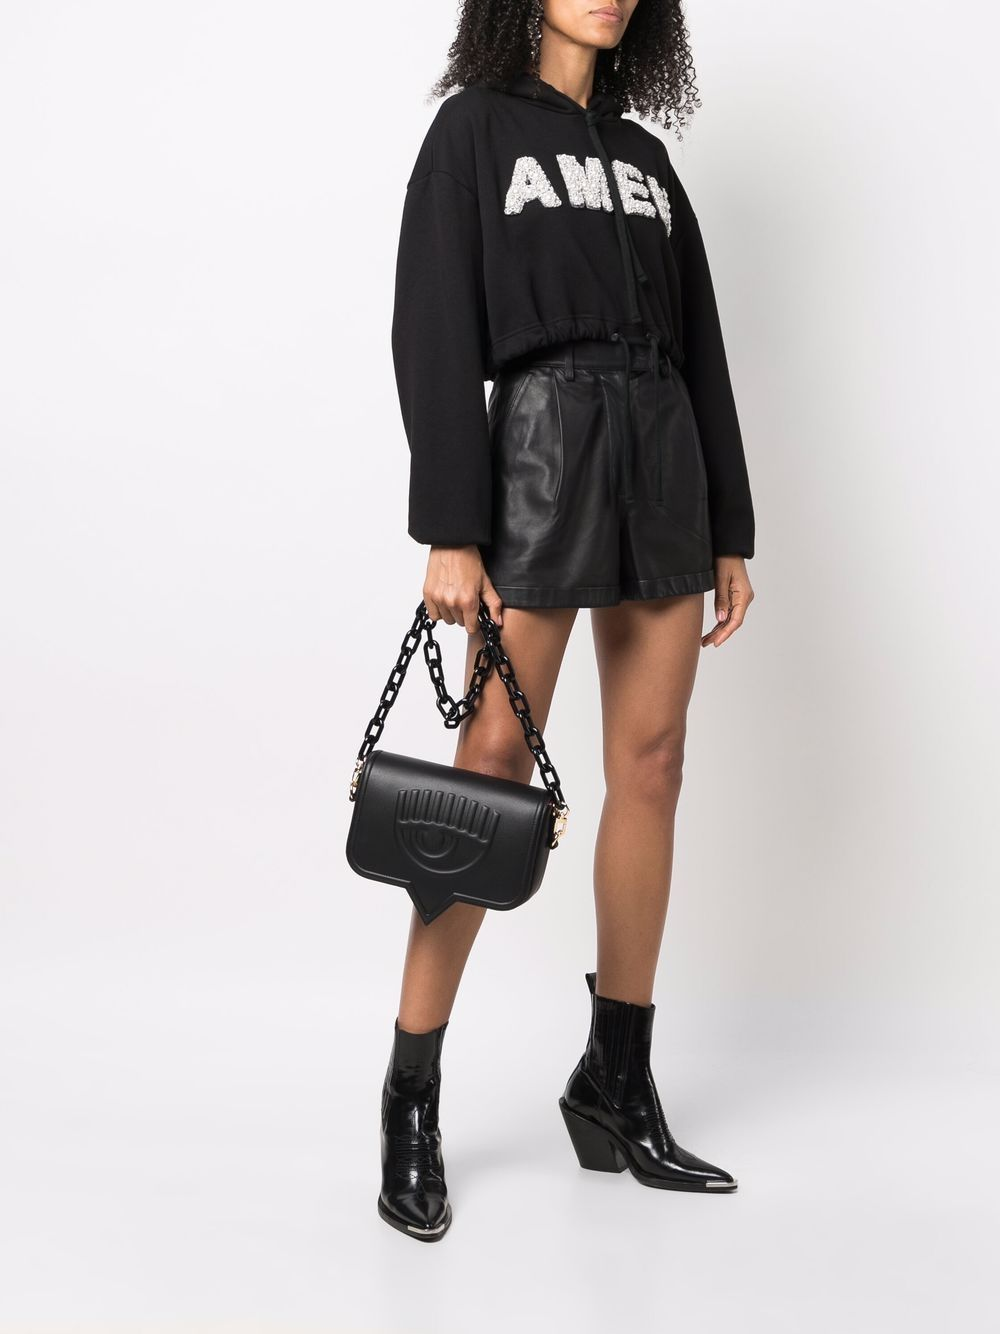 Chiara ferragni bags.. black